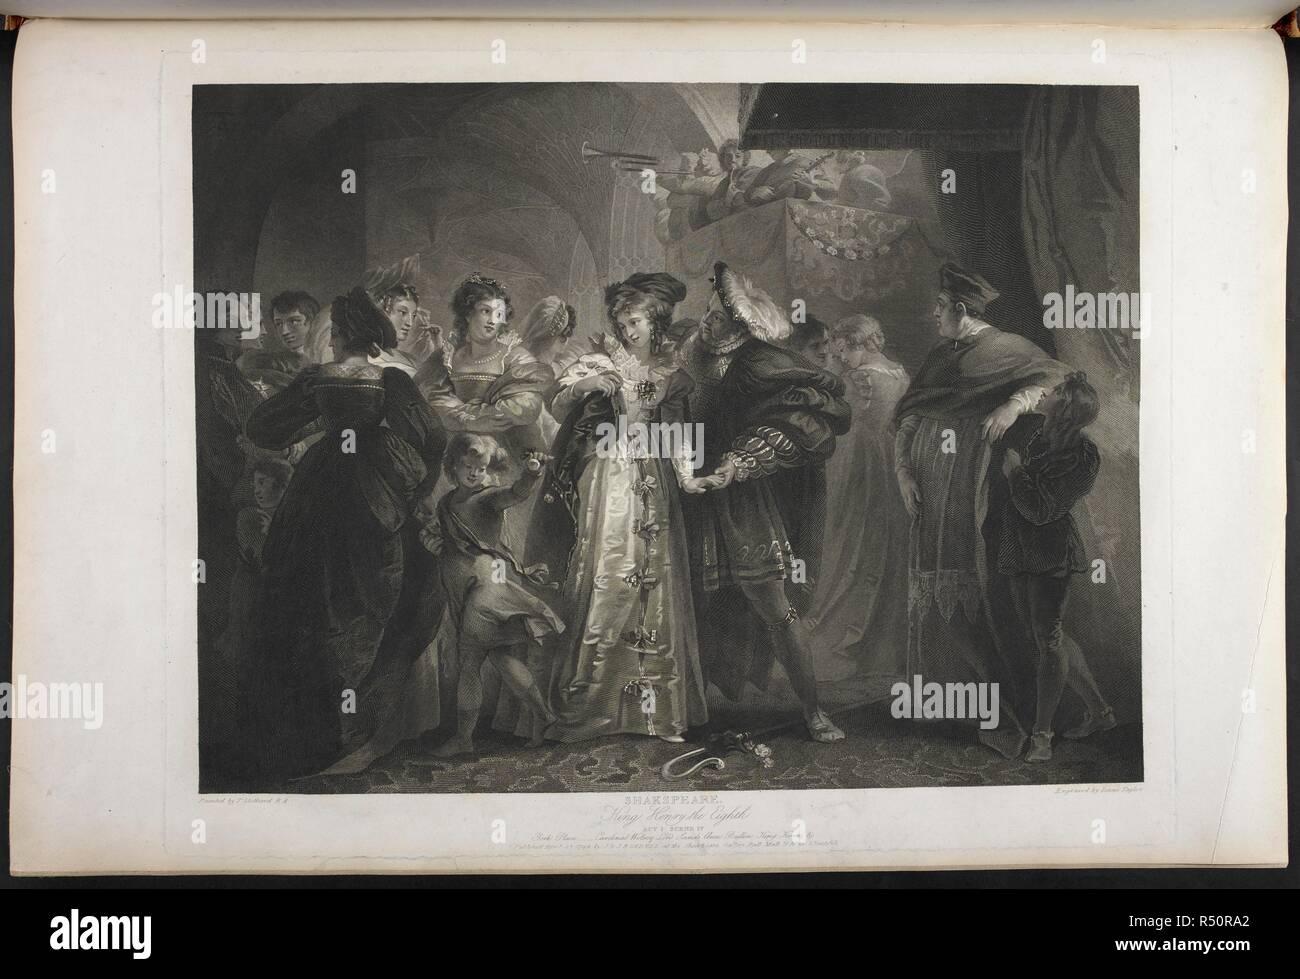 Print circa 90 years Etching Henry VIII Dismissal of Wolsey 1 x